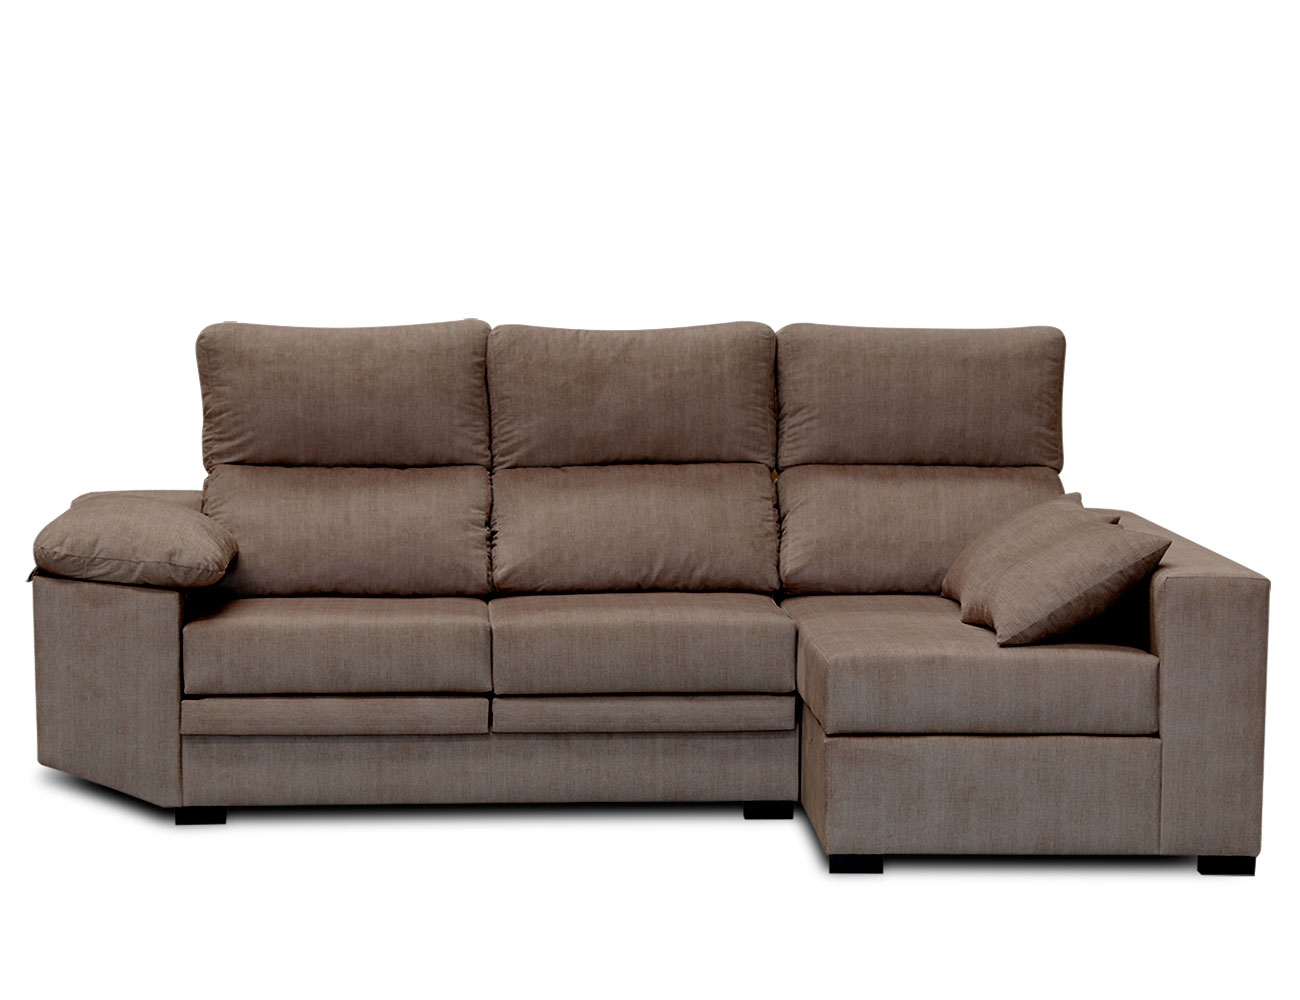 Sofa chaiselongue moderno cojines moka 1